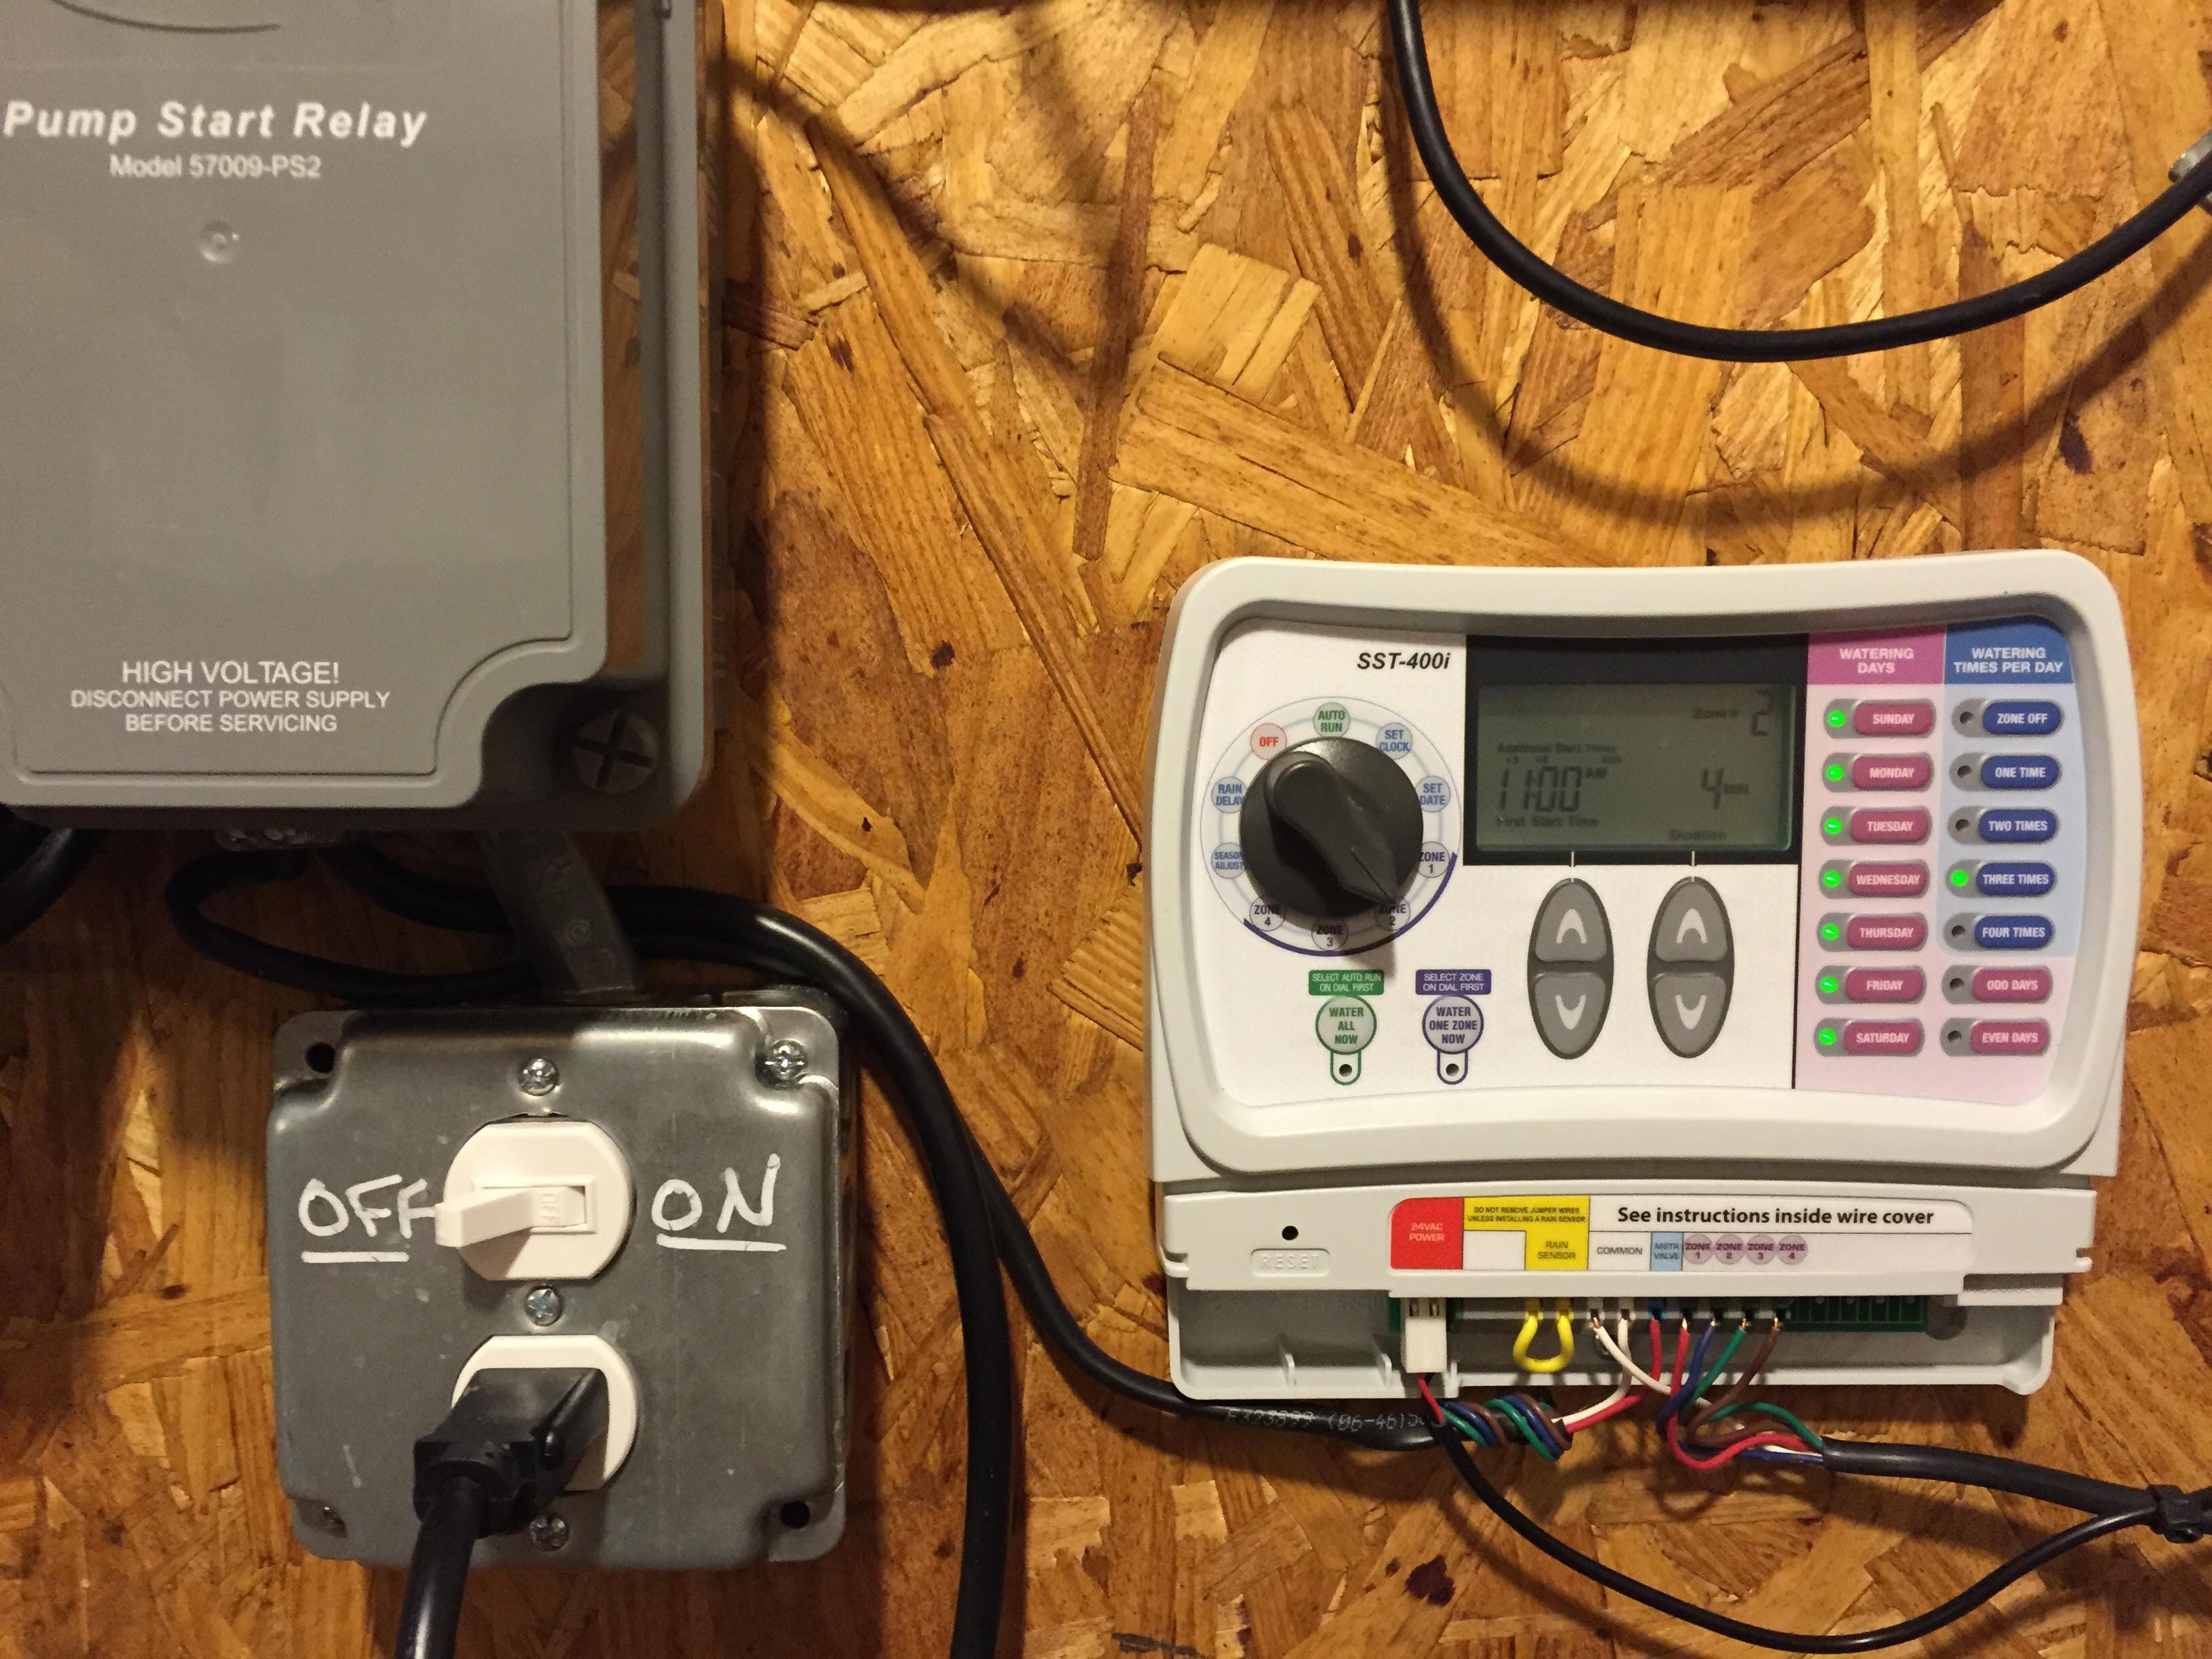 Orbit Pump Relay Wiring Diagram topic Opensprinkler Pump Start Relay Wiring Question Of Orbit Pump Relay Wiring Diagram